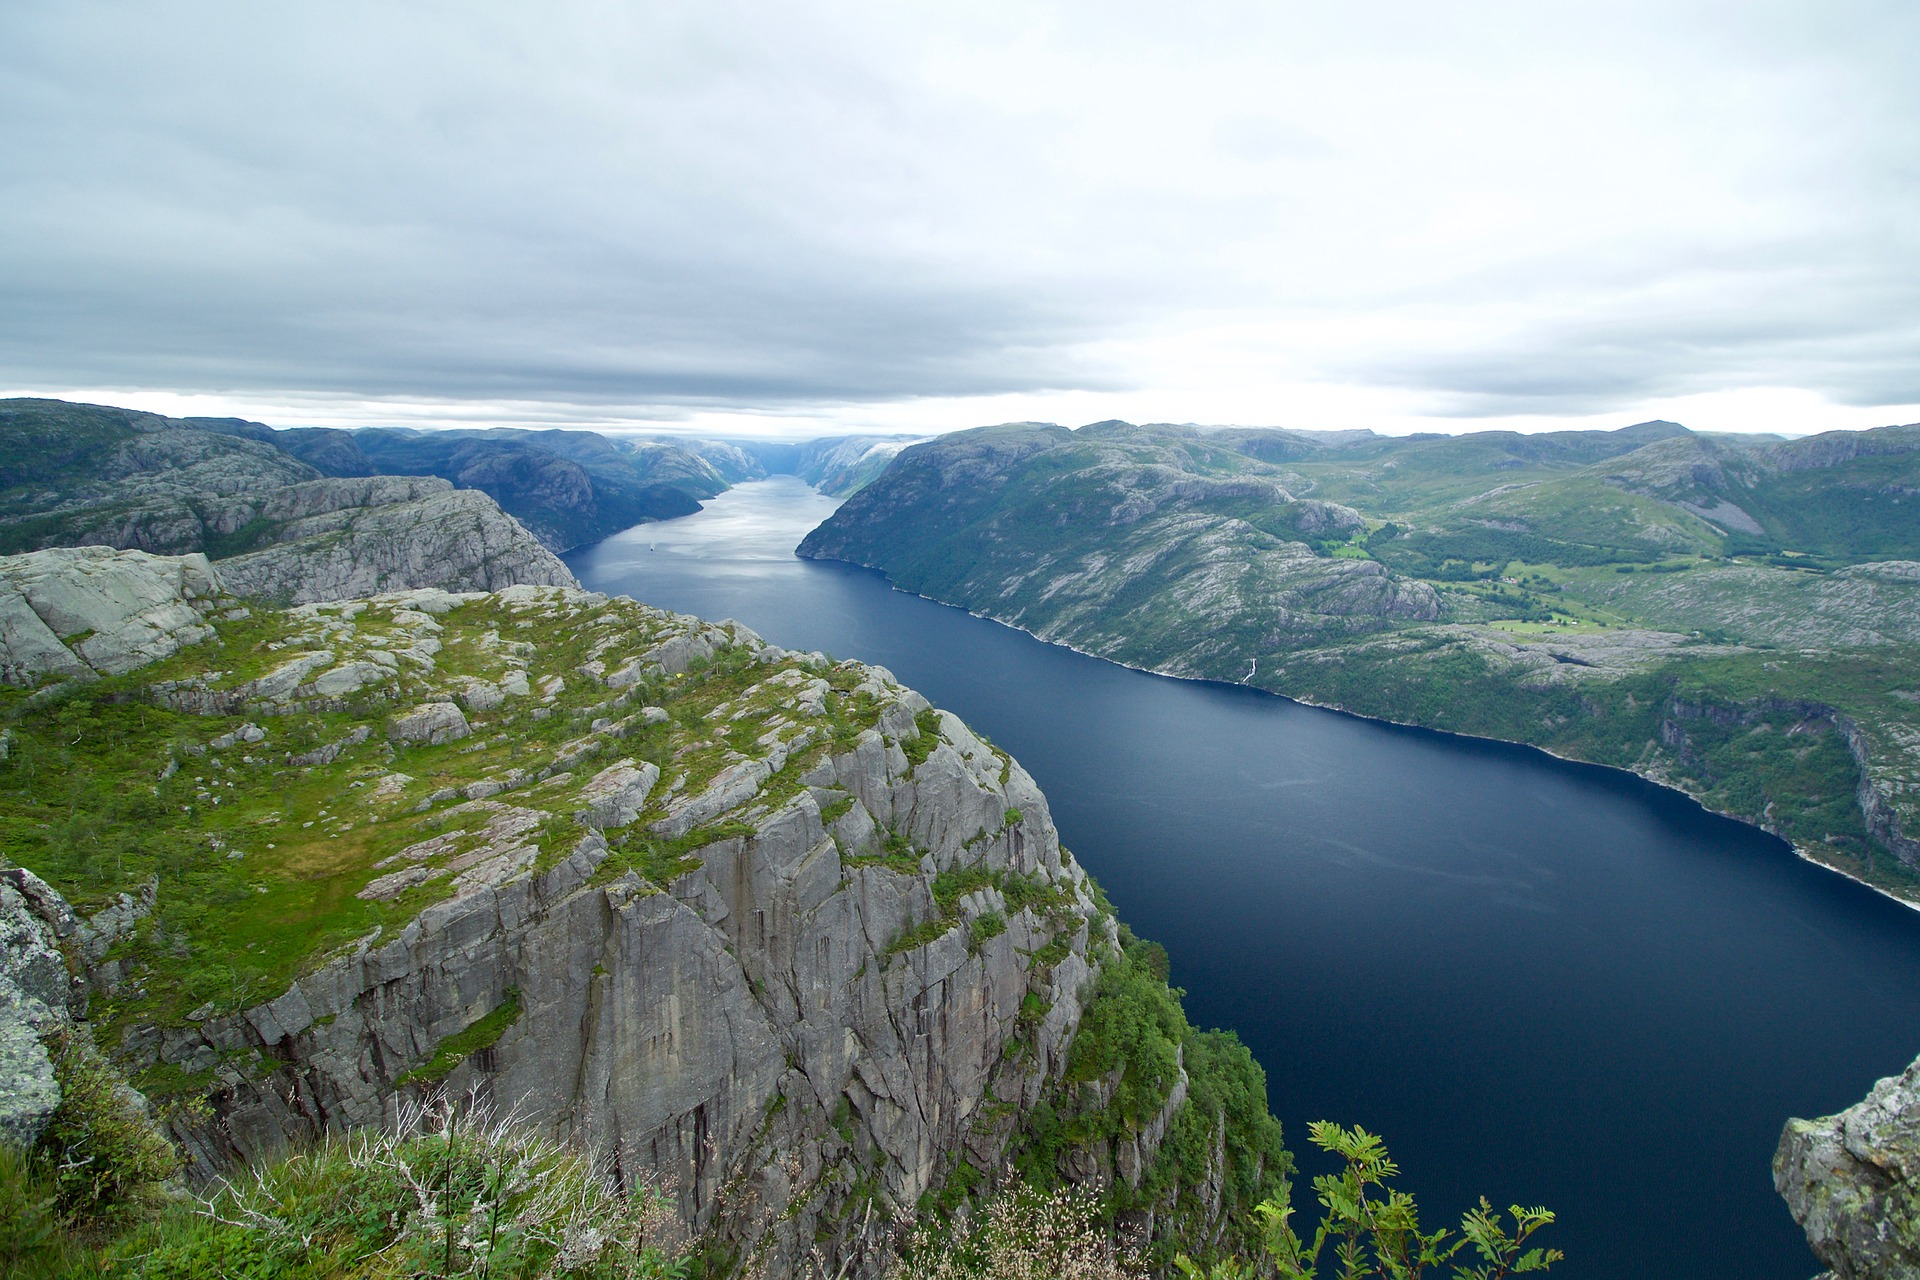 fjord-2641093_1920